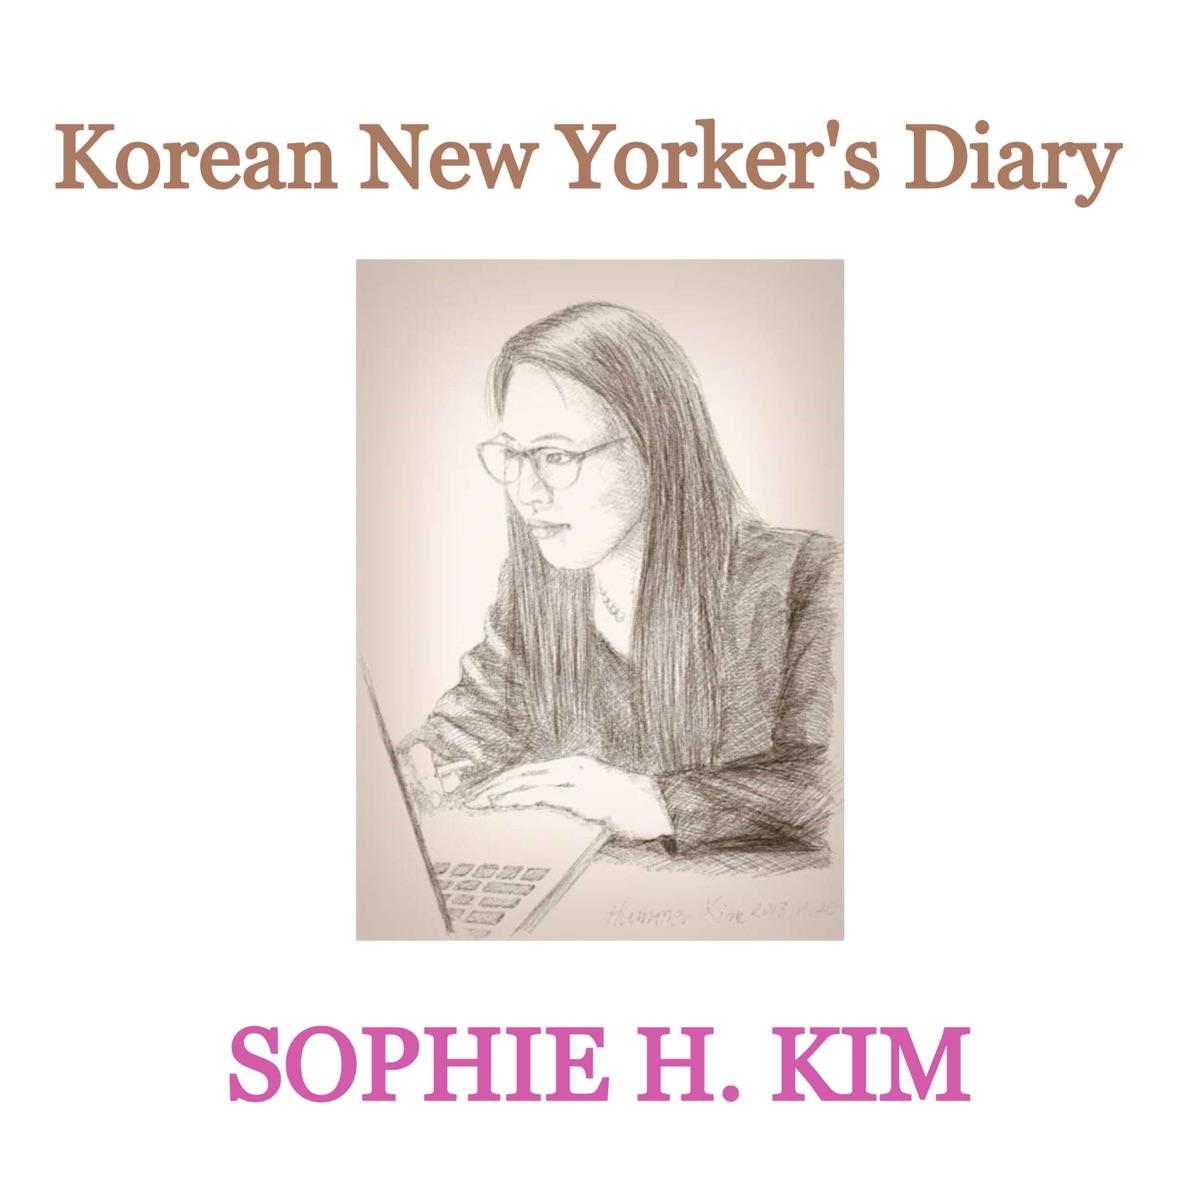 Korean NewYorker